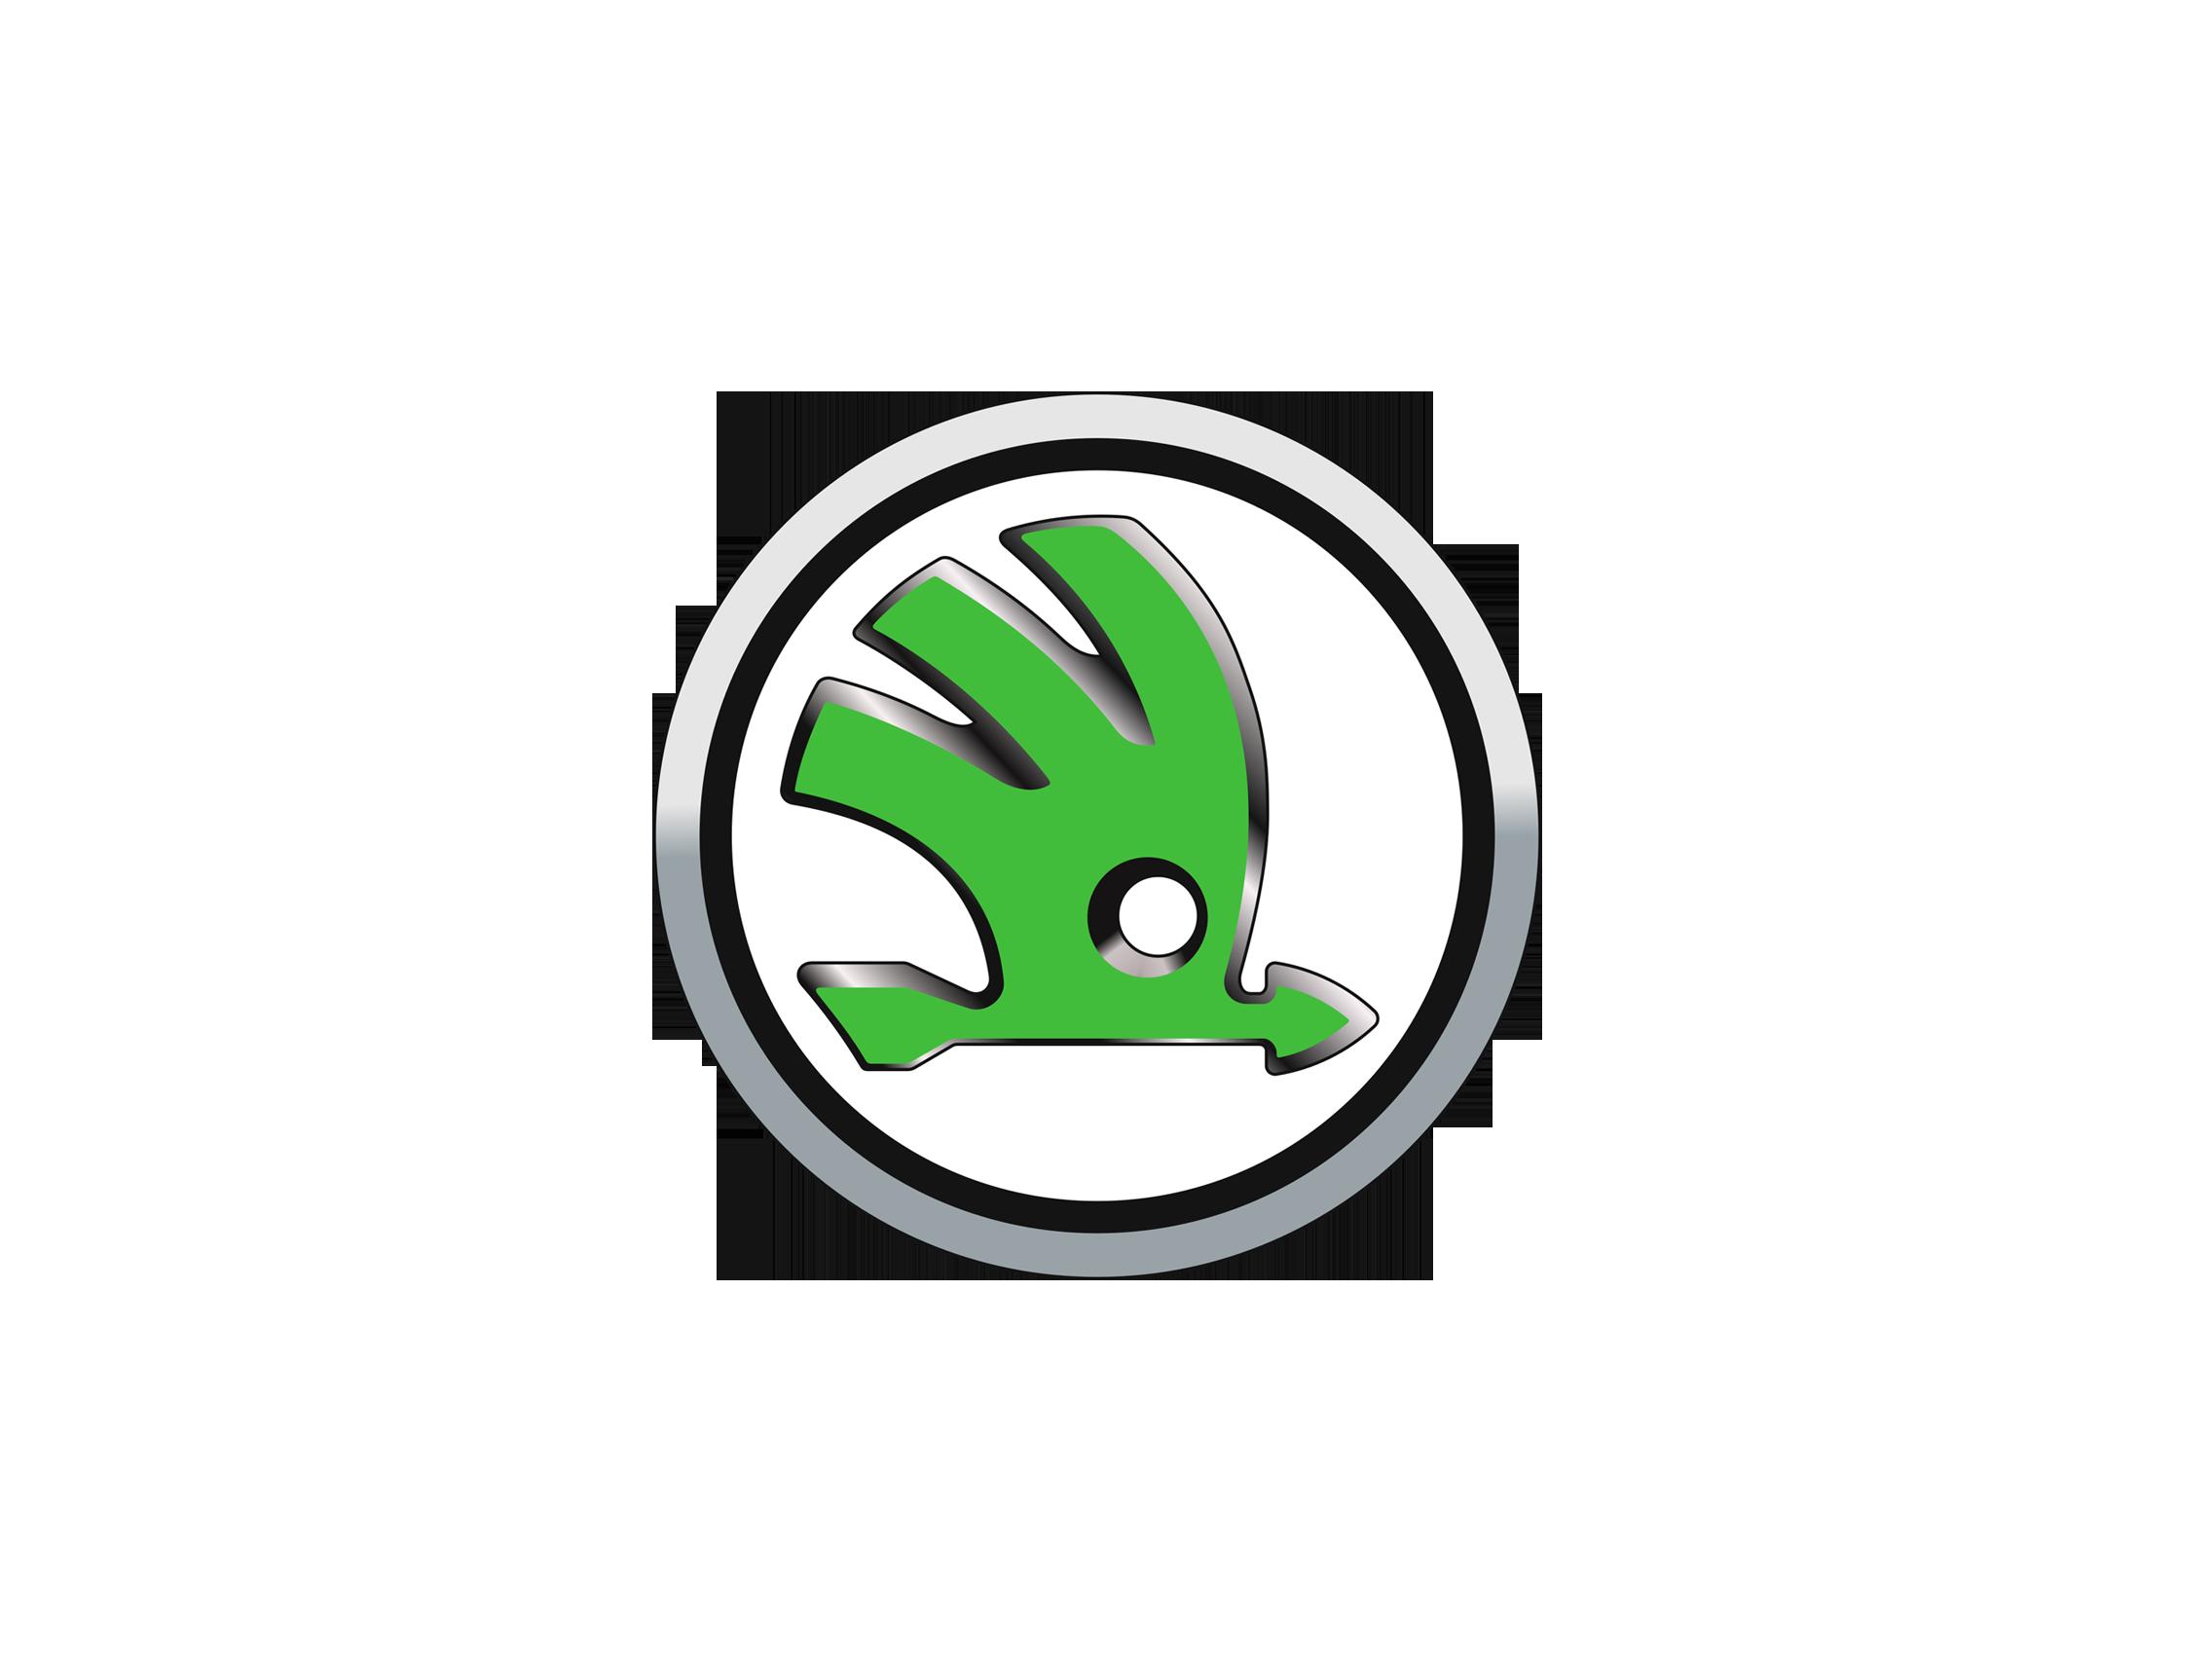 Skoda Symbol.